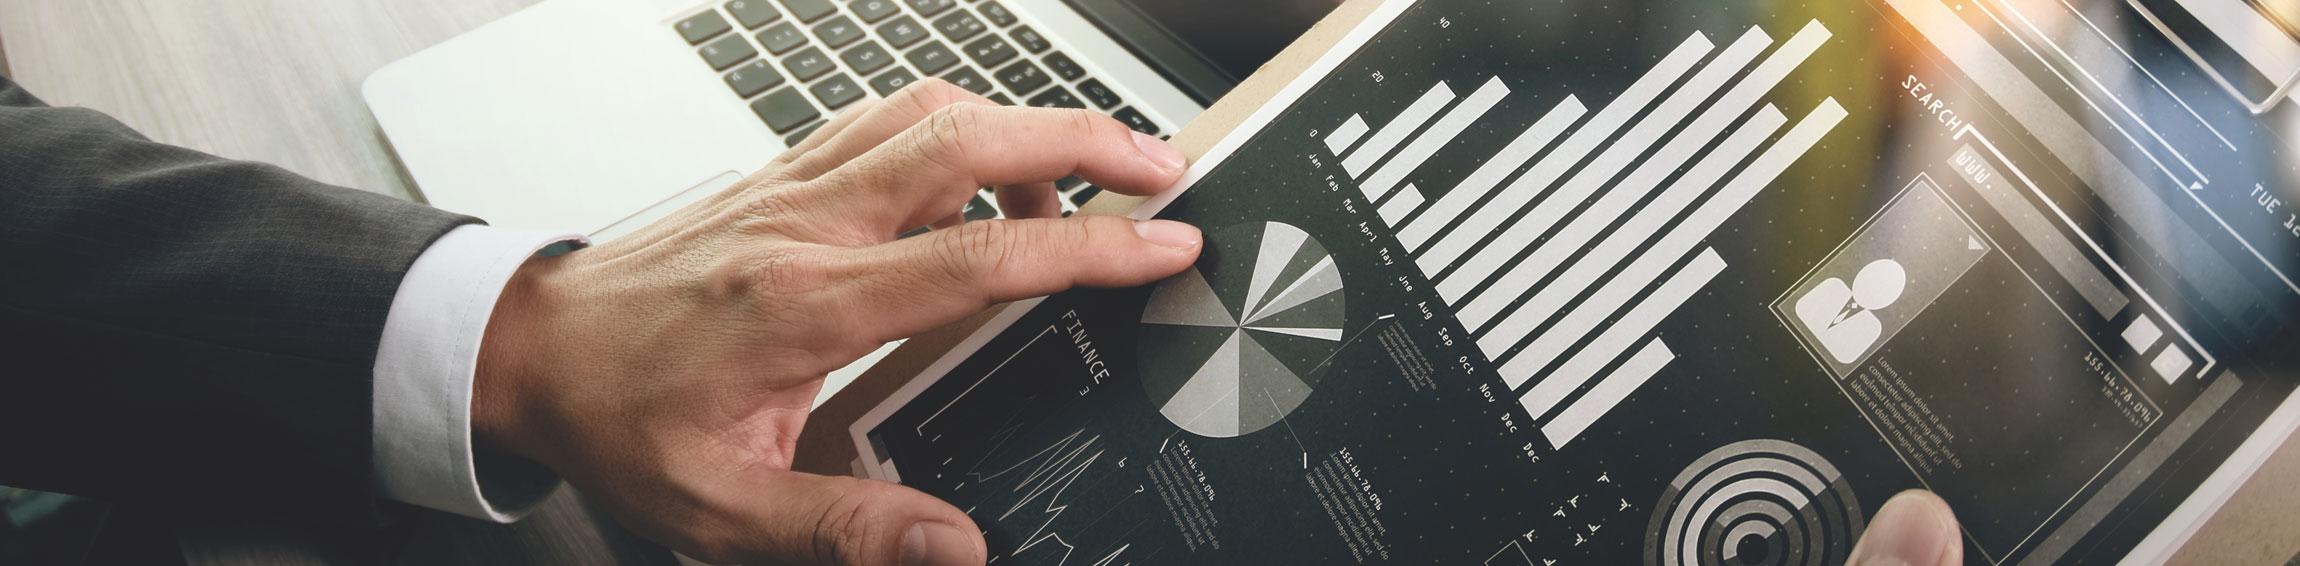 Maximize your call center workforce through forecasting accuracy